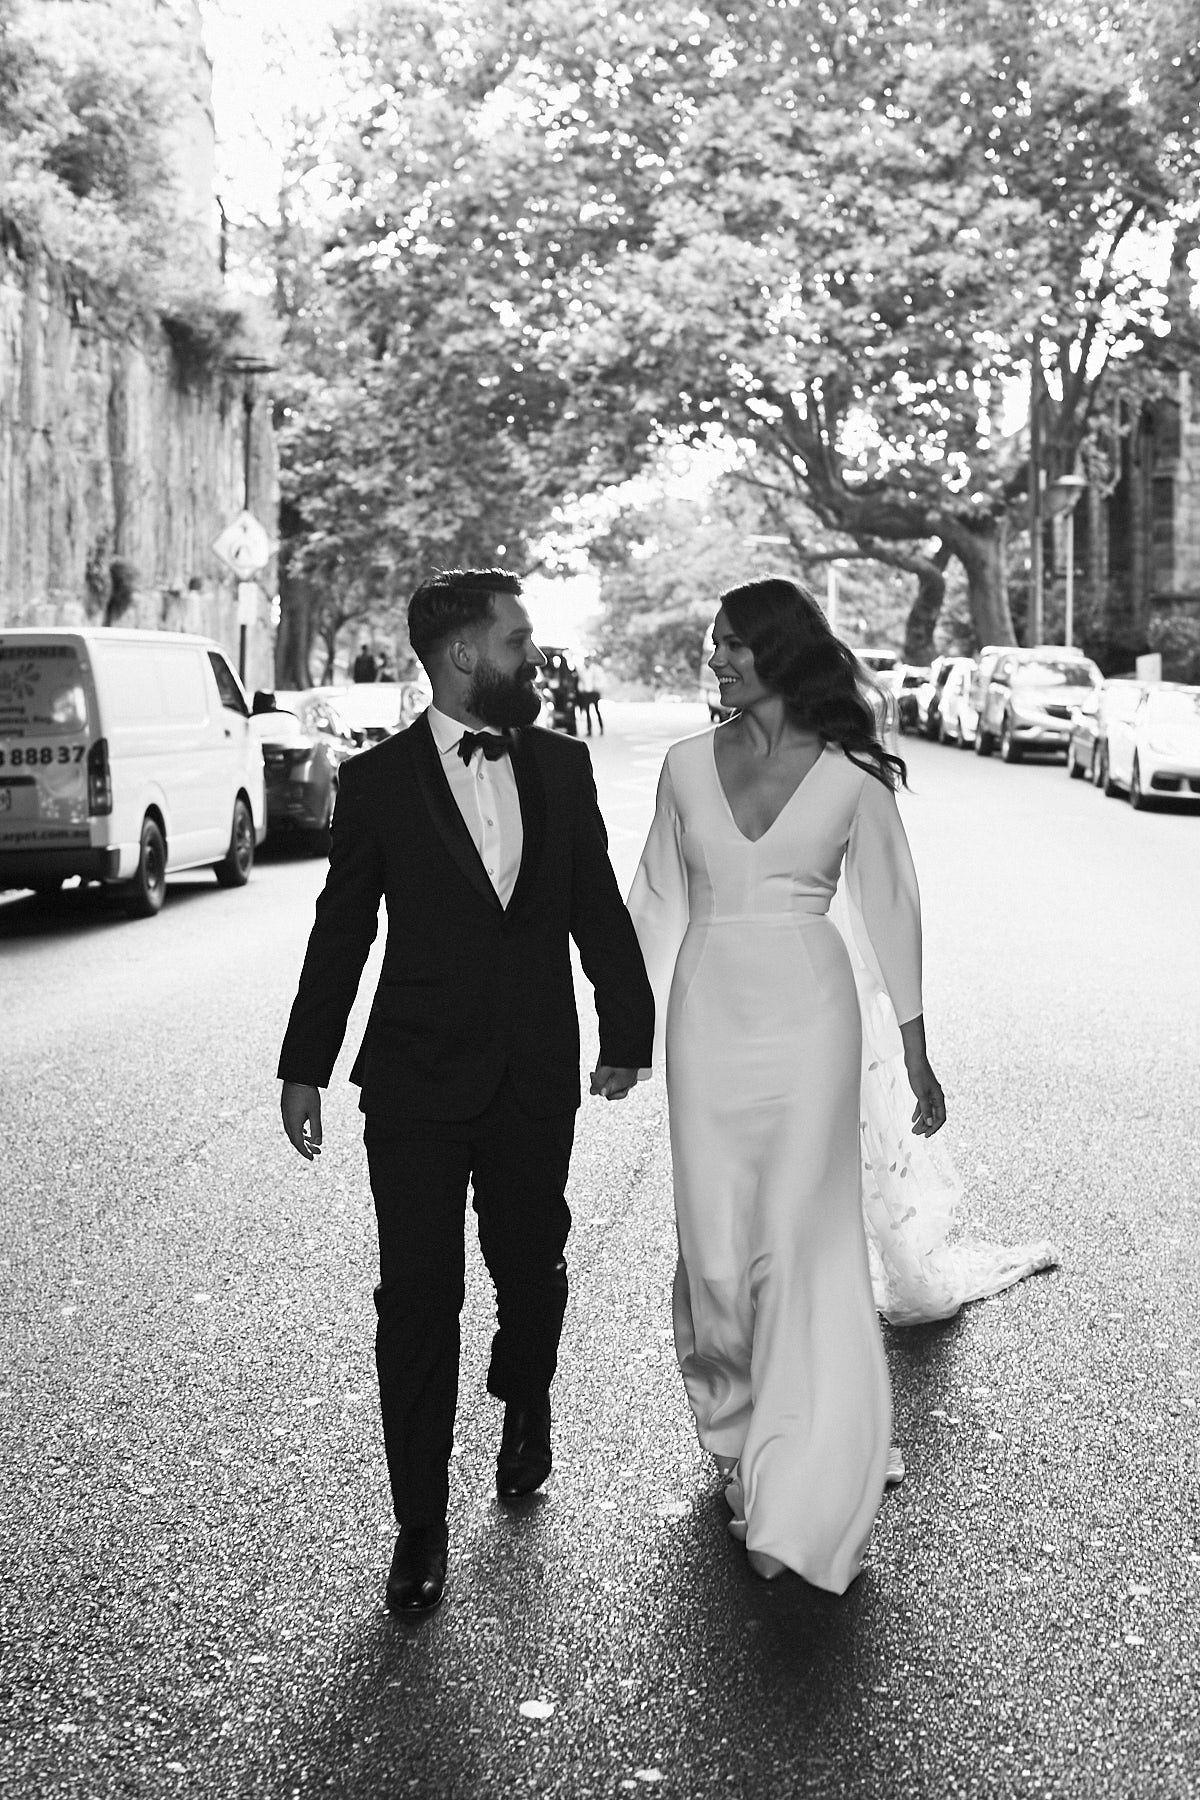 TheLovedOnes-Michelle&Jackson-24Nov18-264.jpg